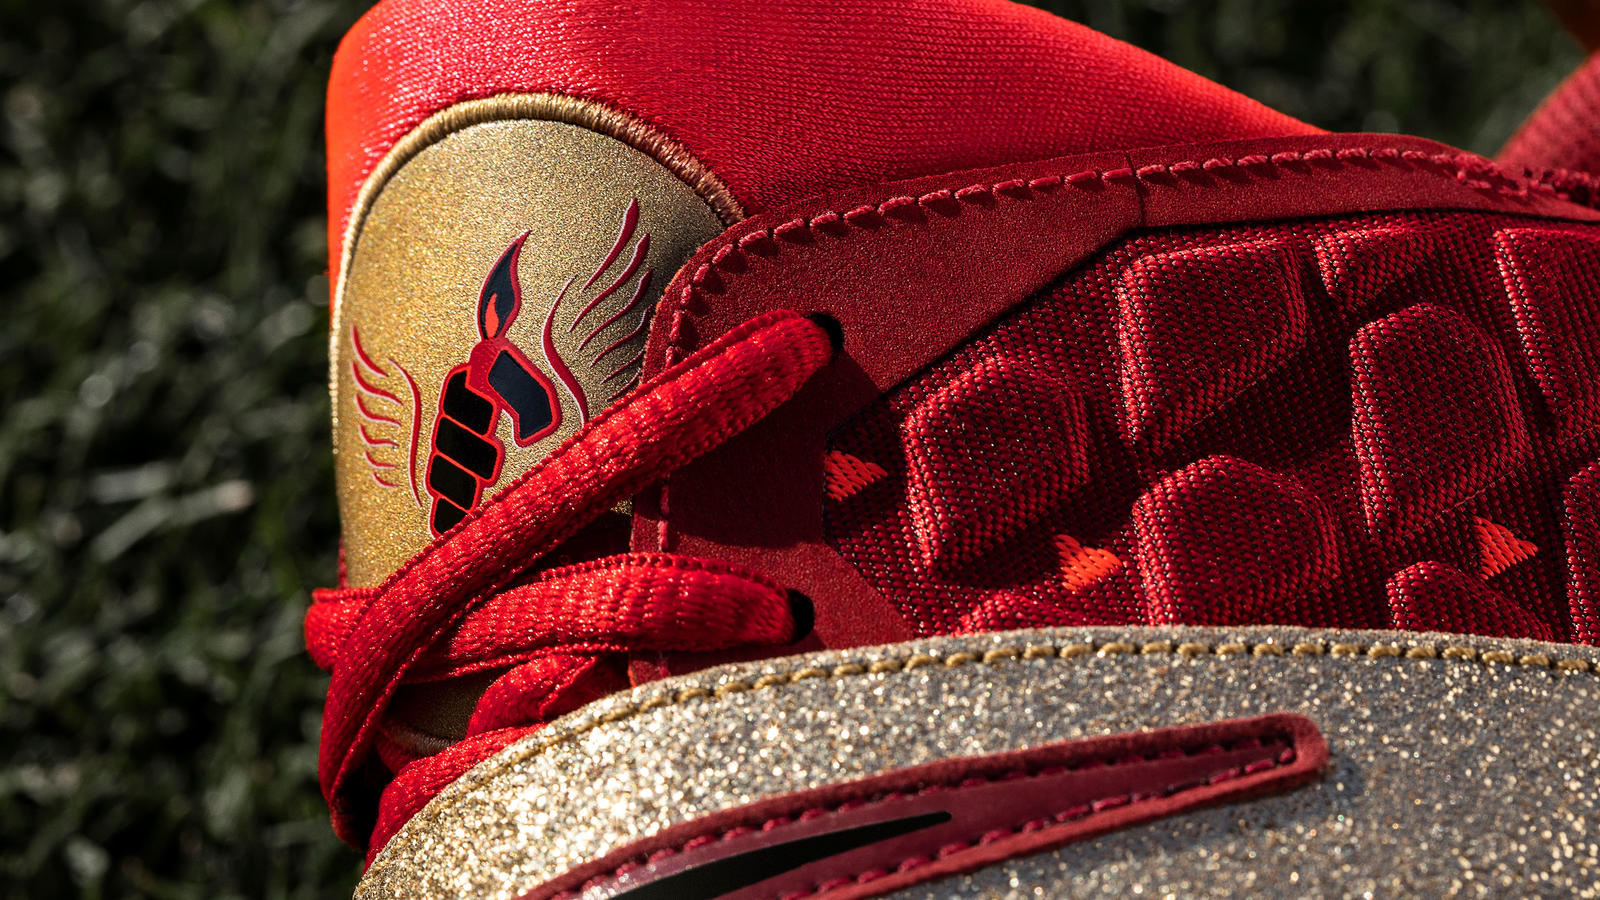 NikeNews_Fa19_BSBL_Trout6_NA_ASG_03_re_hd_1600.jpg